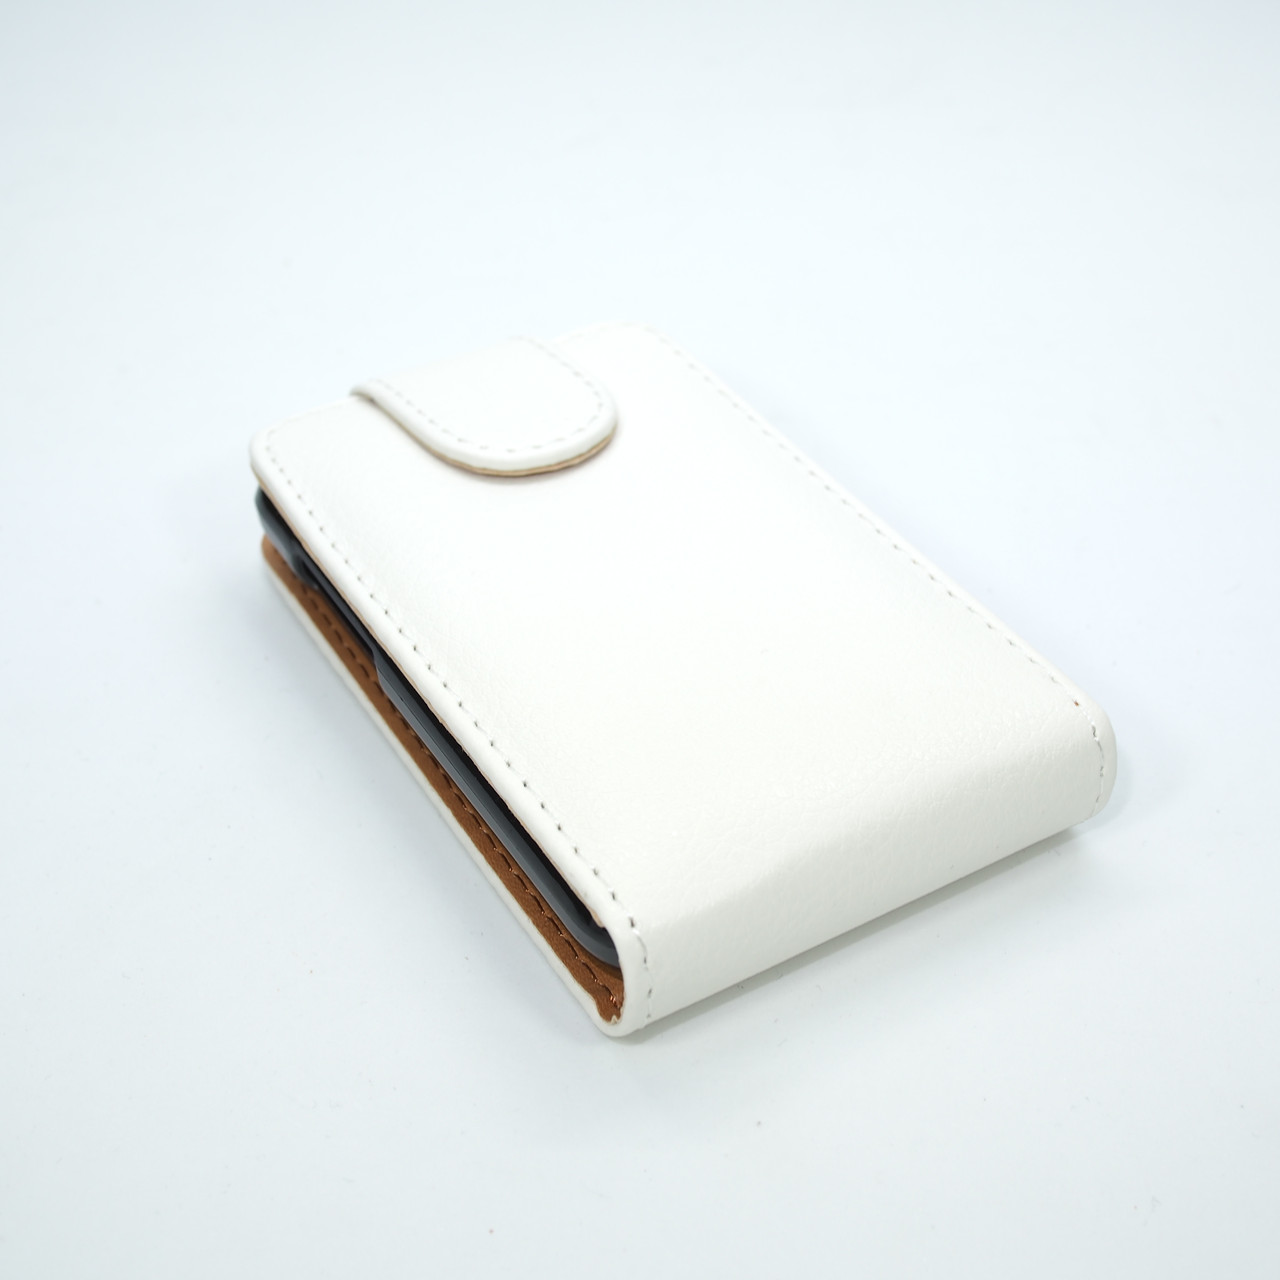 Чехлы для LG Croco L3 2 Для телефона